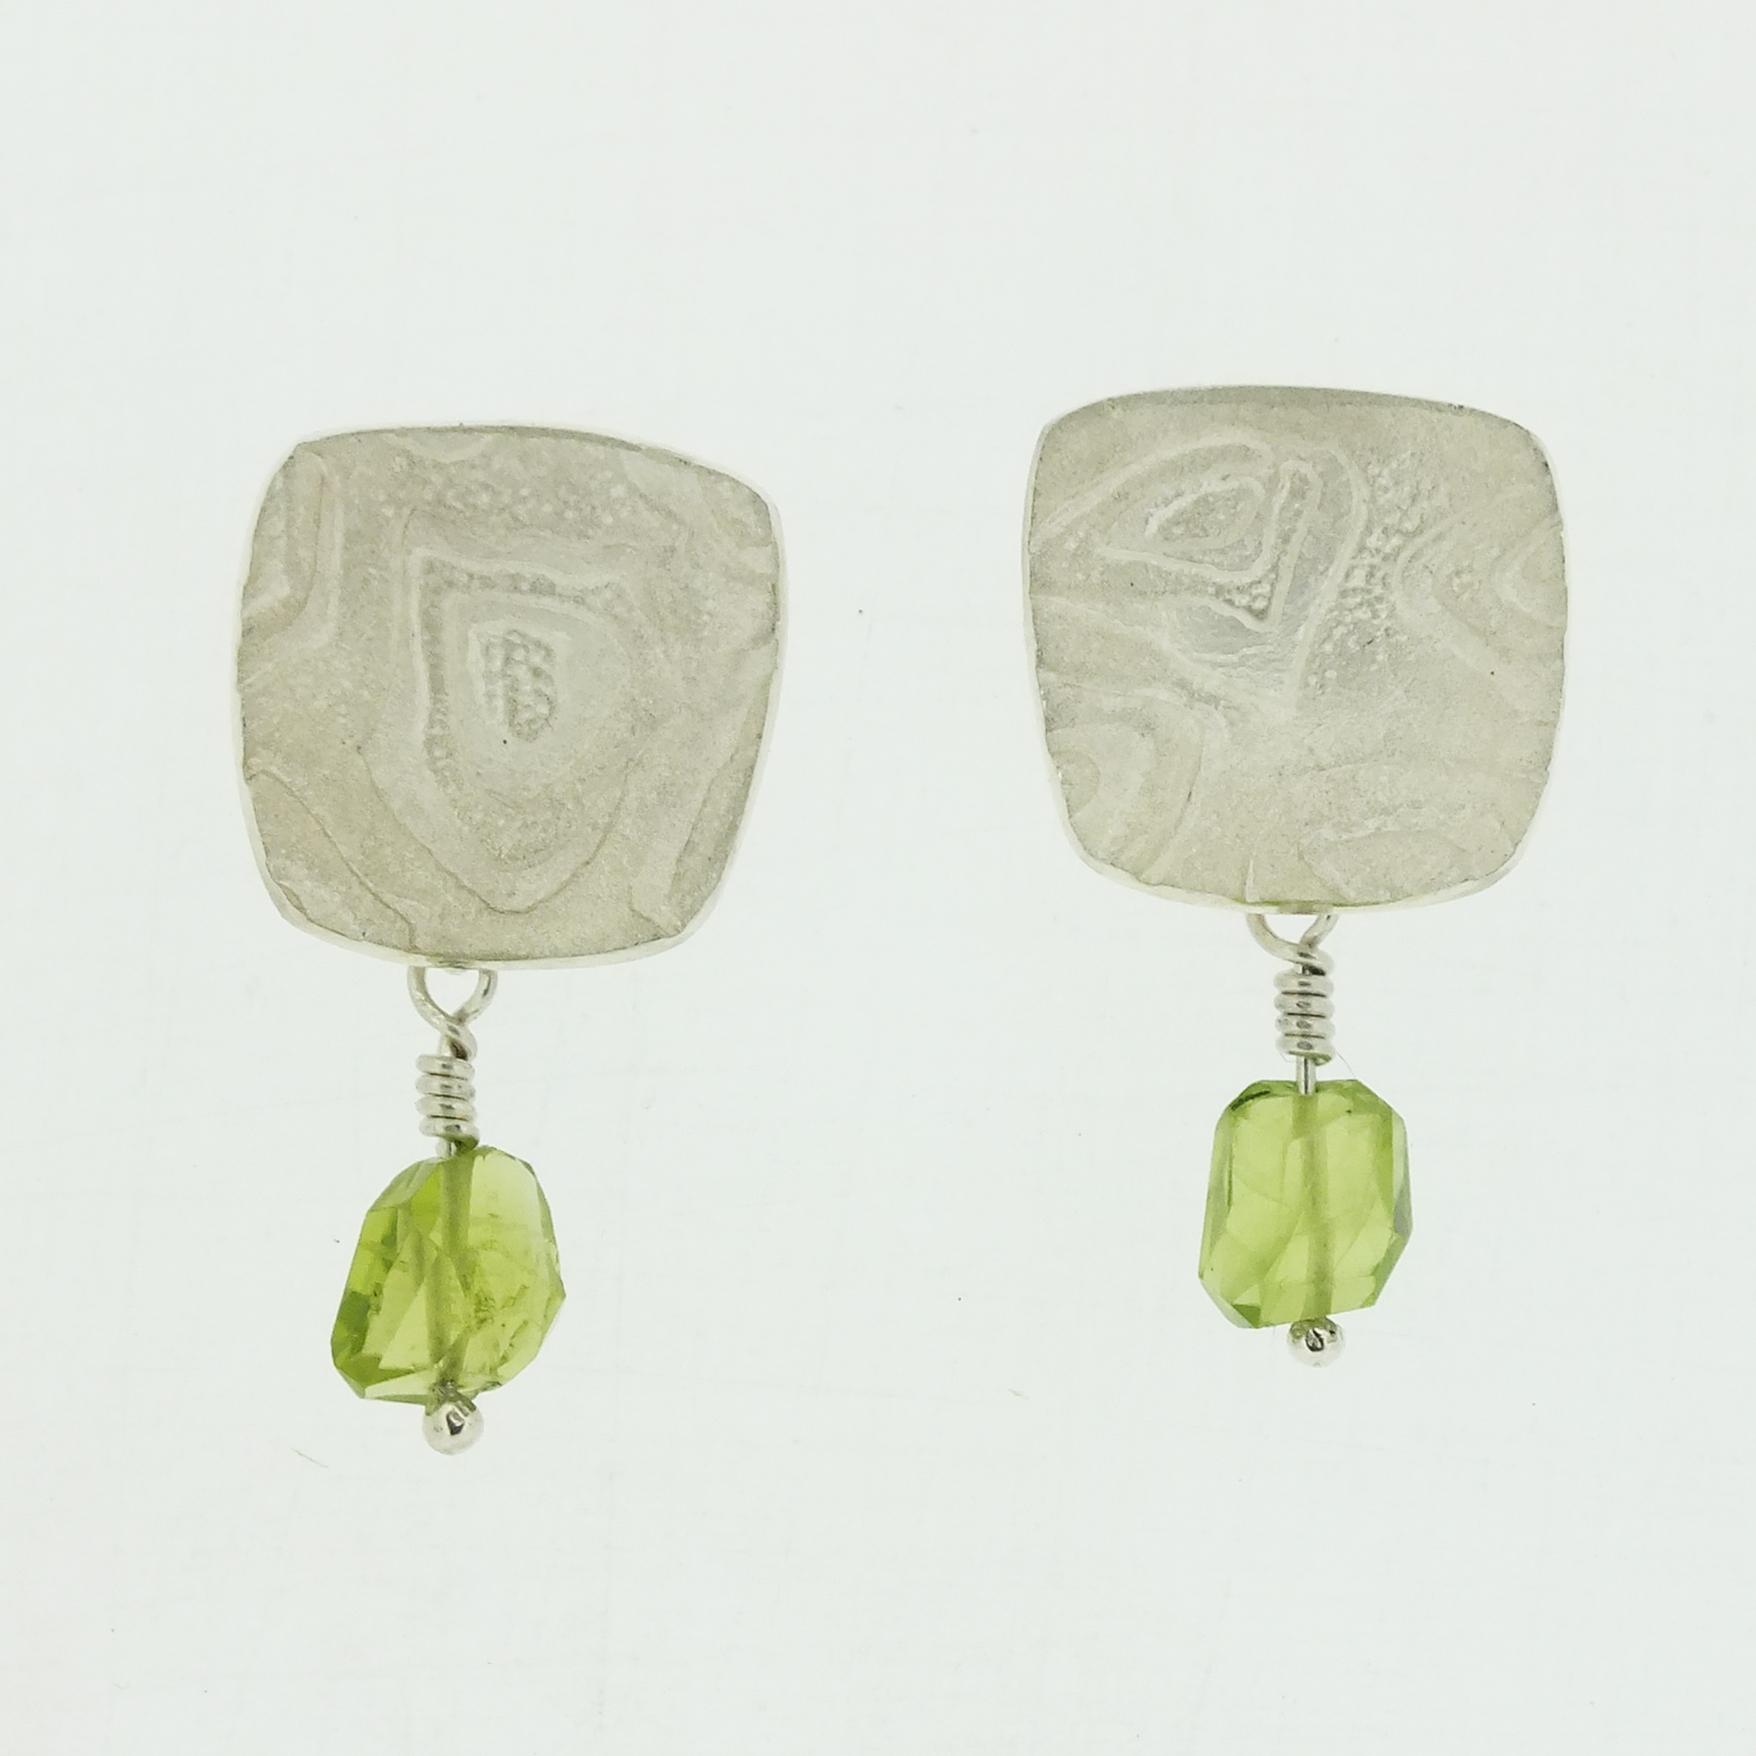 Concave medium 4 neukit textured silver stud earrings with peridot bead drop